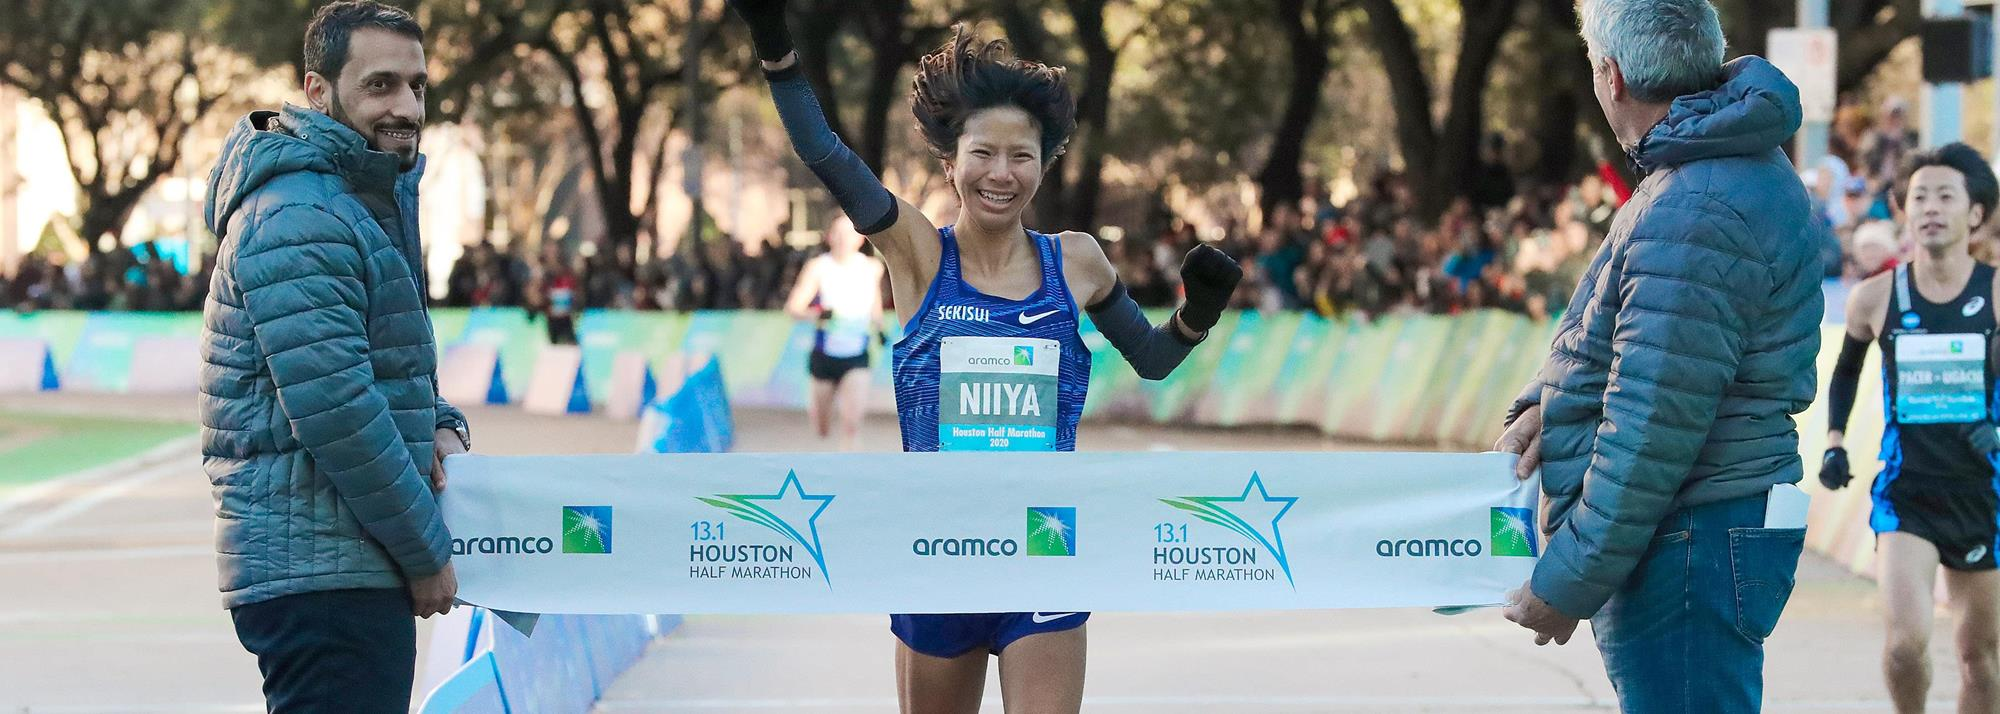 Niiya breaks Japanese half-marathon record in Houston